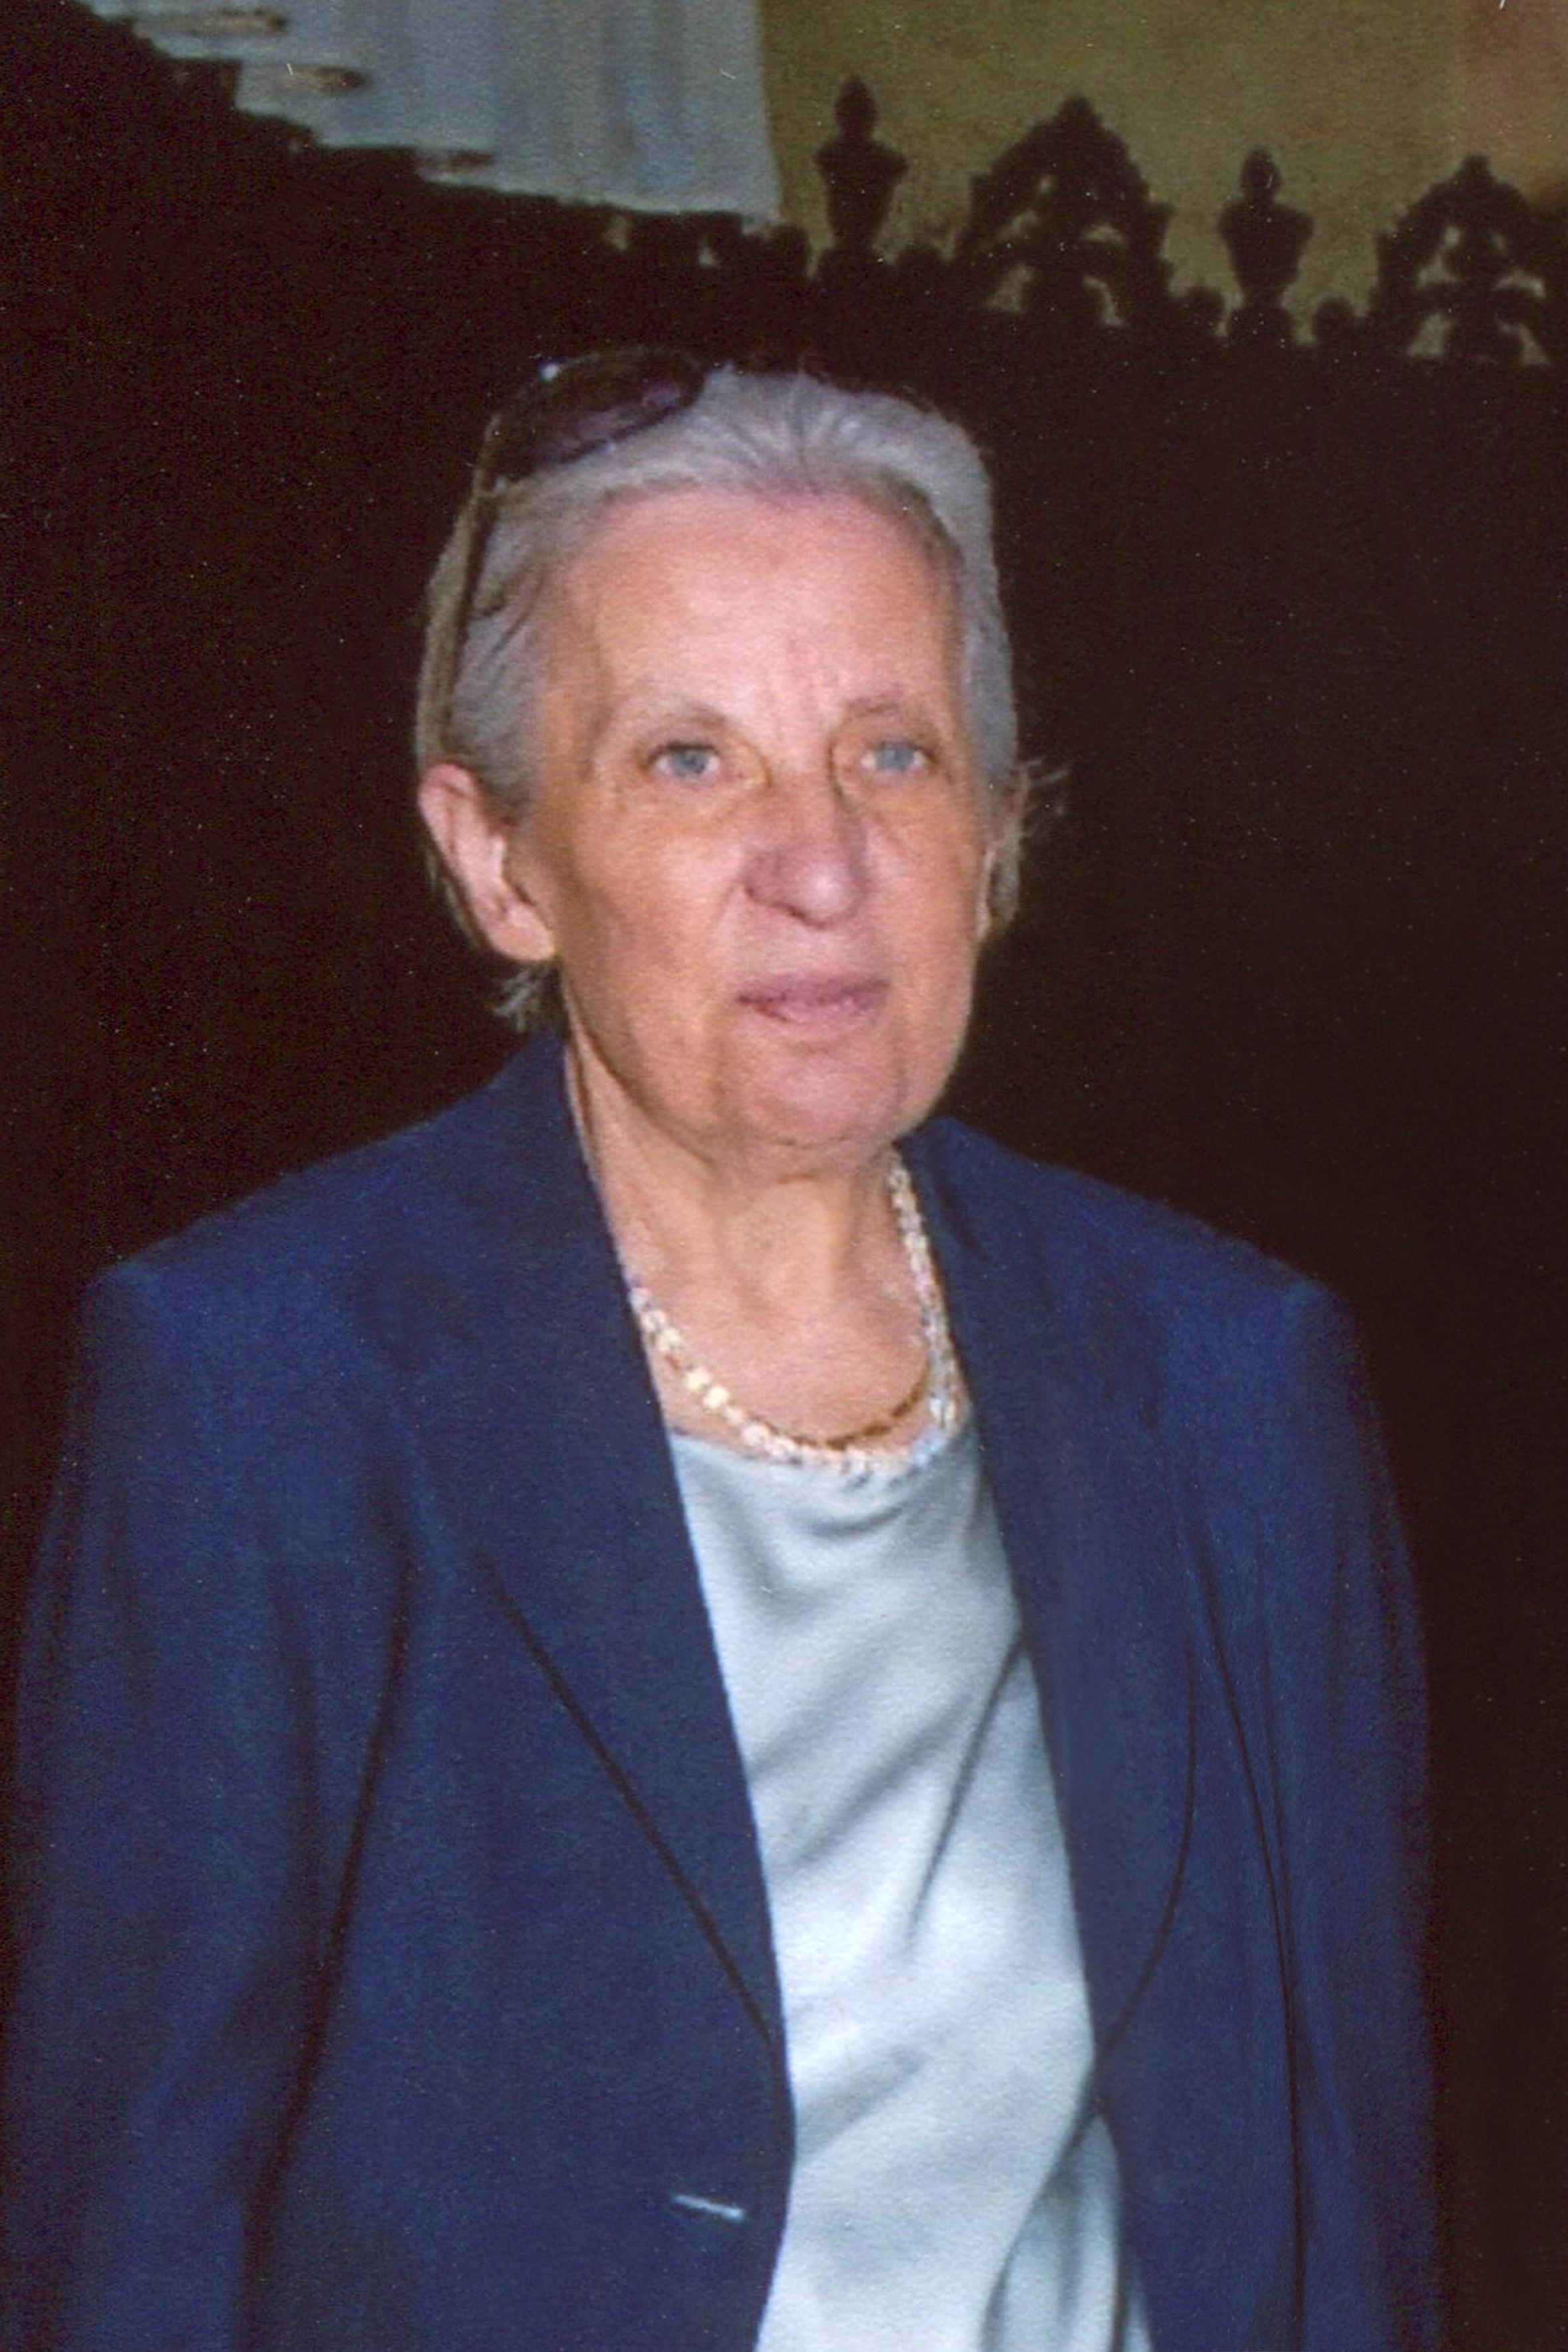 ROSA MARIANI